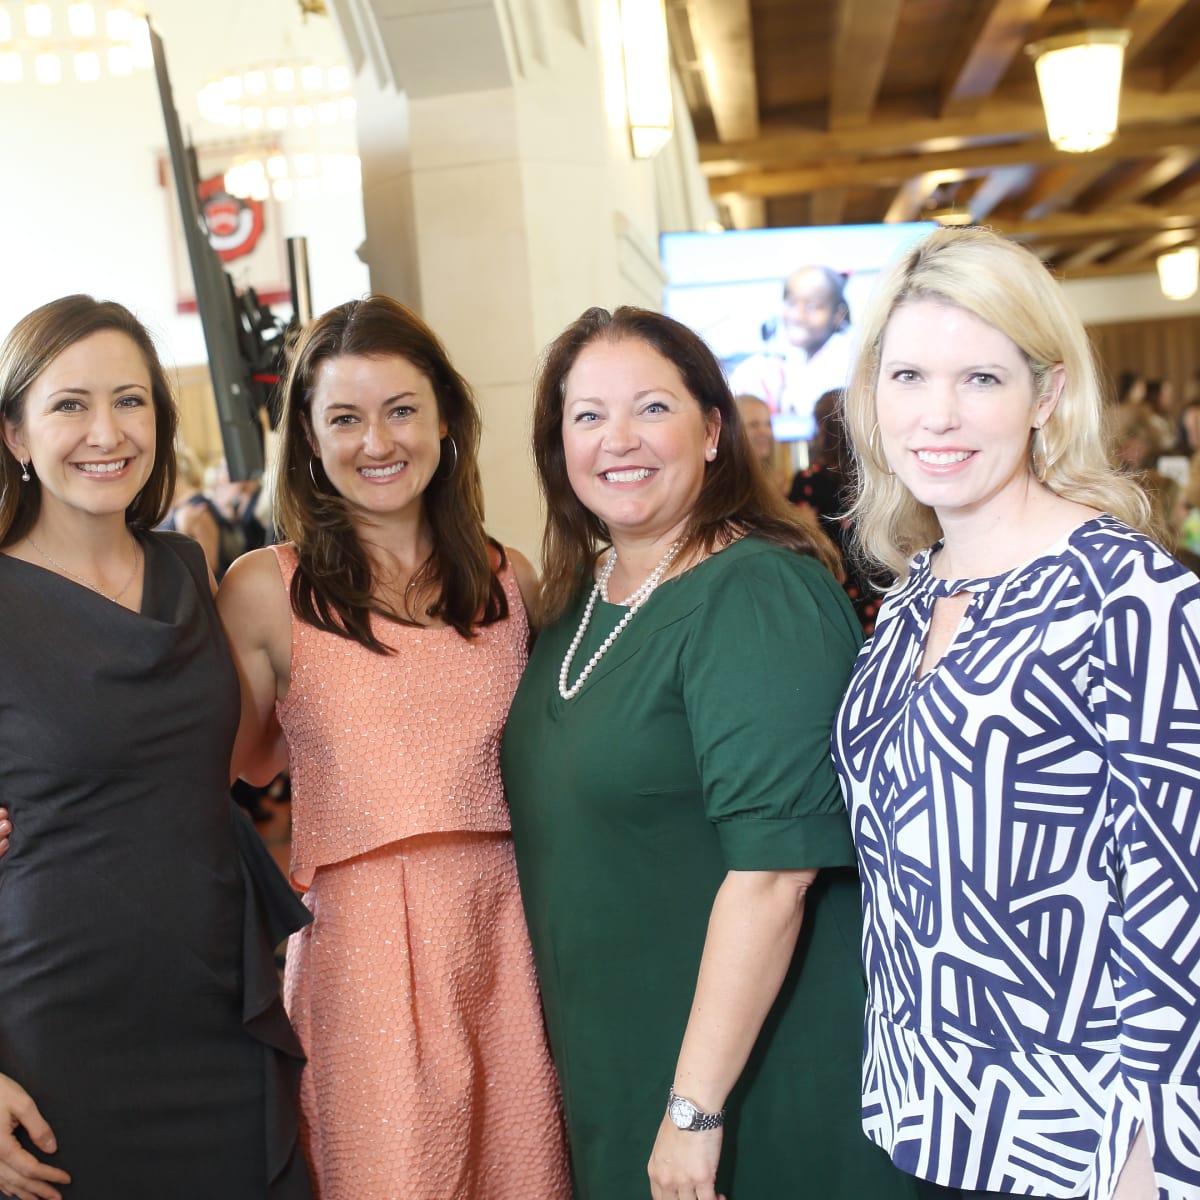 Breakthrough Houston, March 2016, Melissa Lowery, Patrice Heins, Allison Leach, Courtney toomey